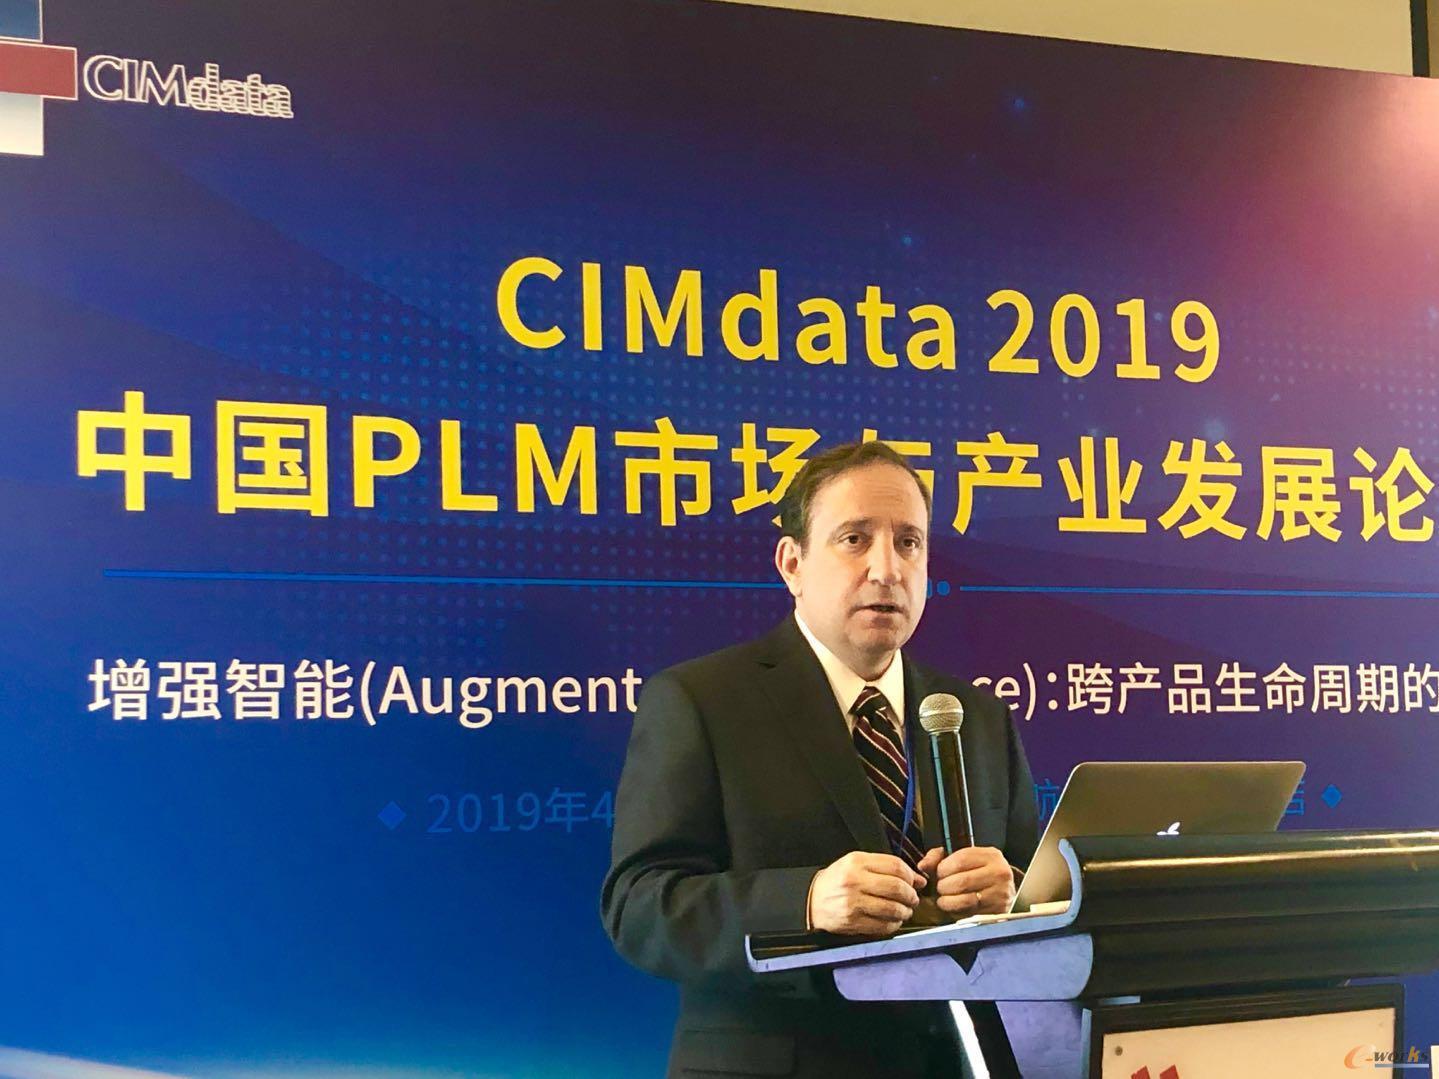 CIMdata 2019中国PLM市场与产业发展论坛成功举办